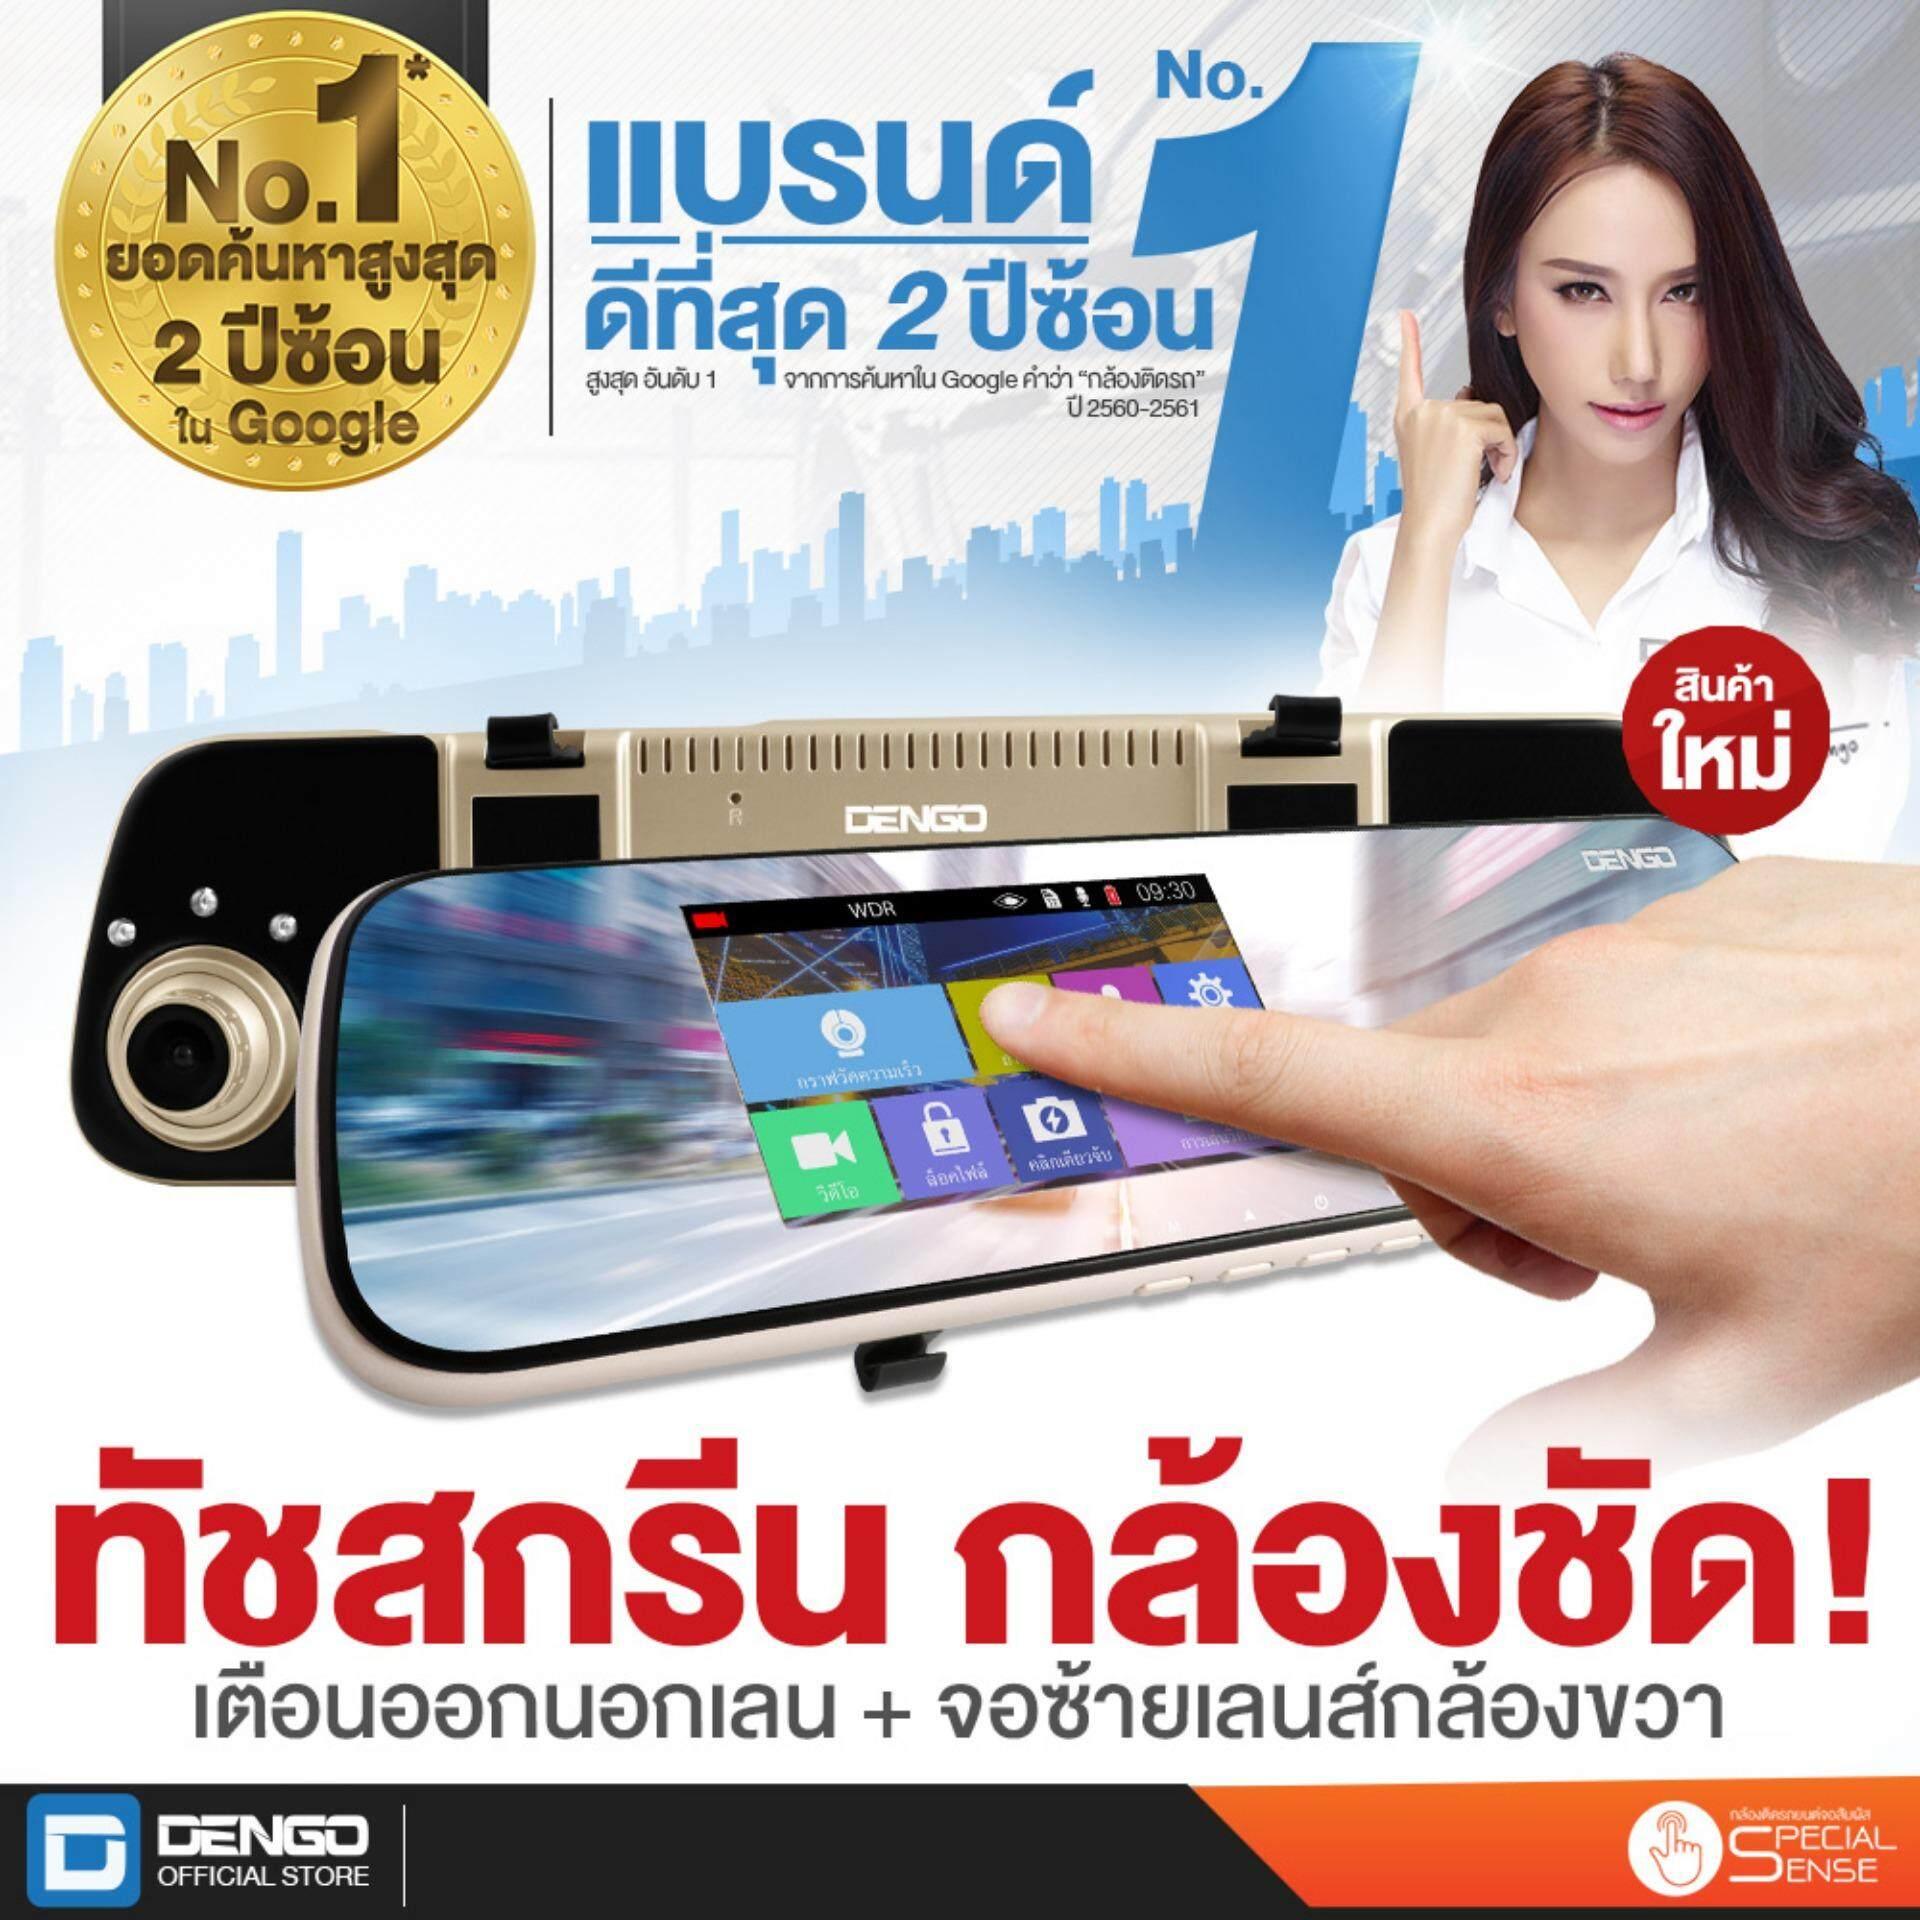 Dengo Special Sense (gold) คุ้มกว่า! กับนวัตกรรมใหม่ล่าสุด เจ้าแรก เจ้าเดียวในไทย จอระบบสัมผัส กระจกสีขาว จอด้านซ้าย เลนกล้องด้านขวา พร้อมอินฟาเรดมากสุดถึง 5 ดวง By First One International.